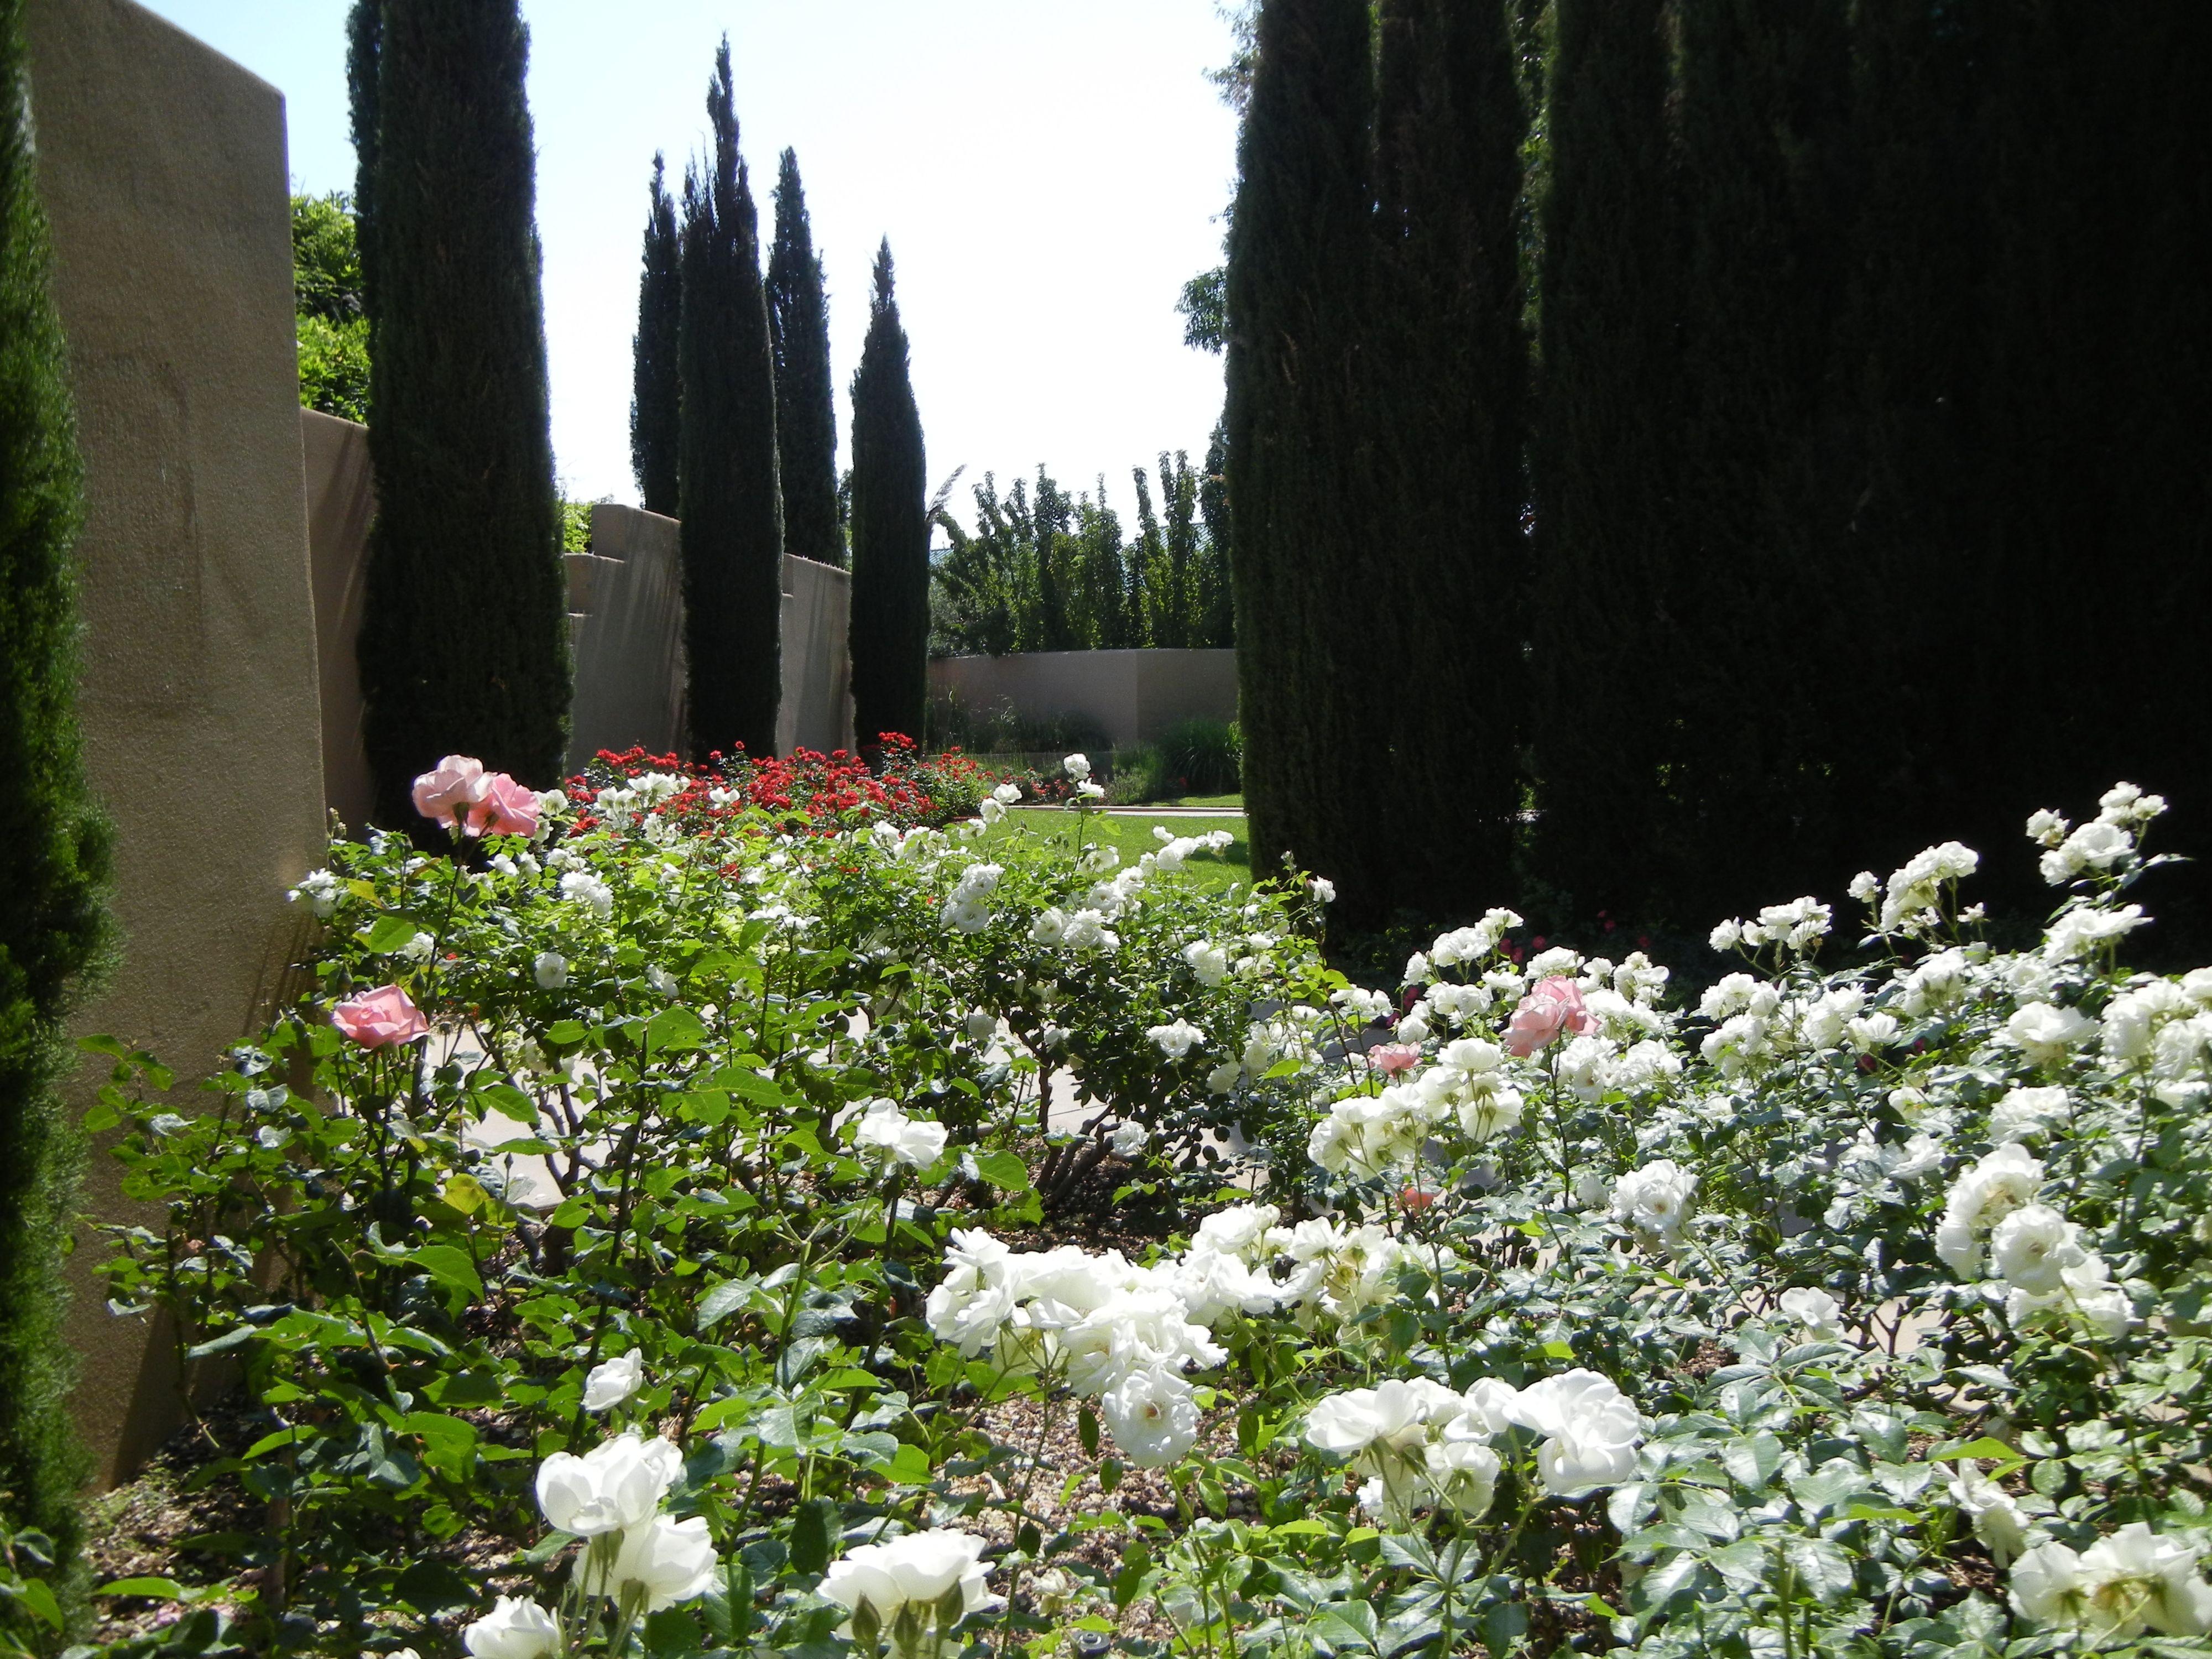 Botanical Garden Albuquerque New Mexico Favorite Places And Spaces